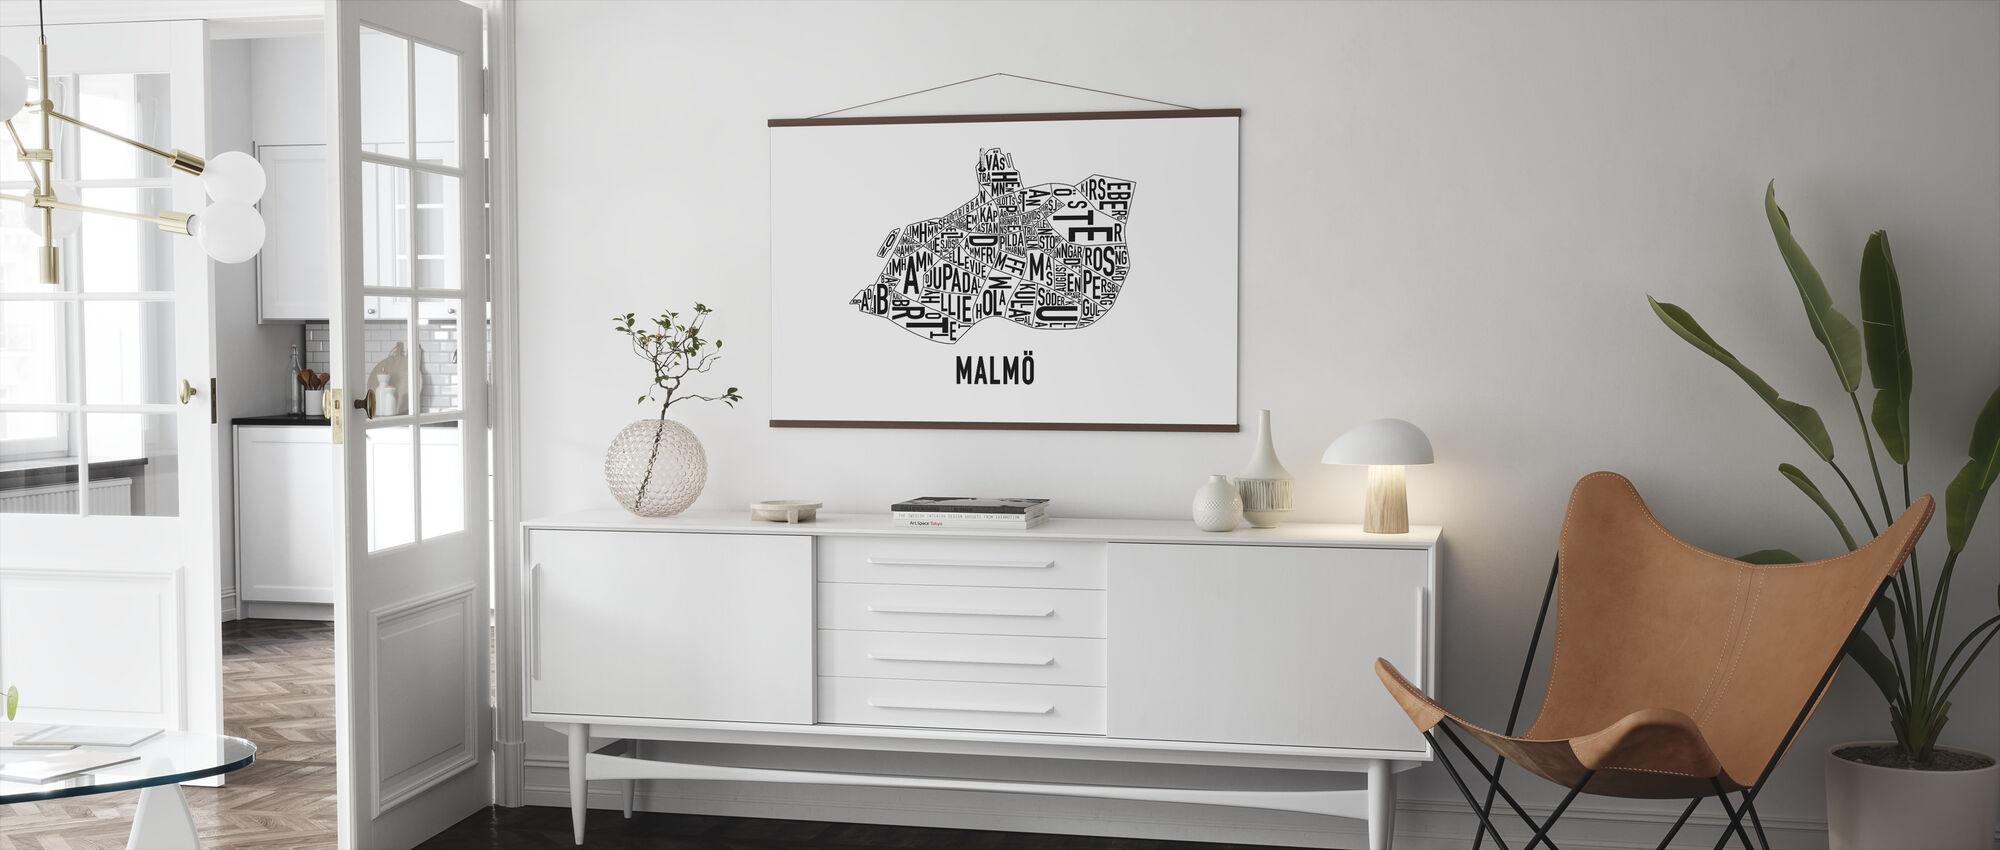 Malmö - Poster - Vardagsrum